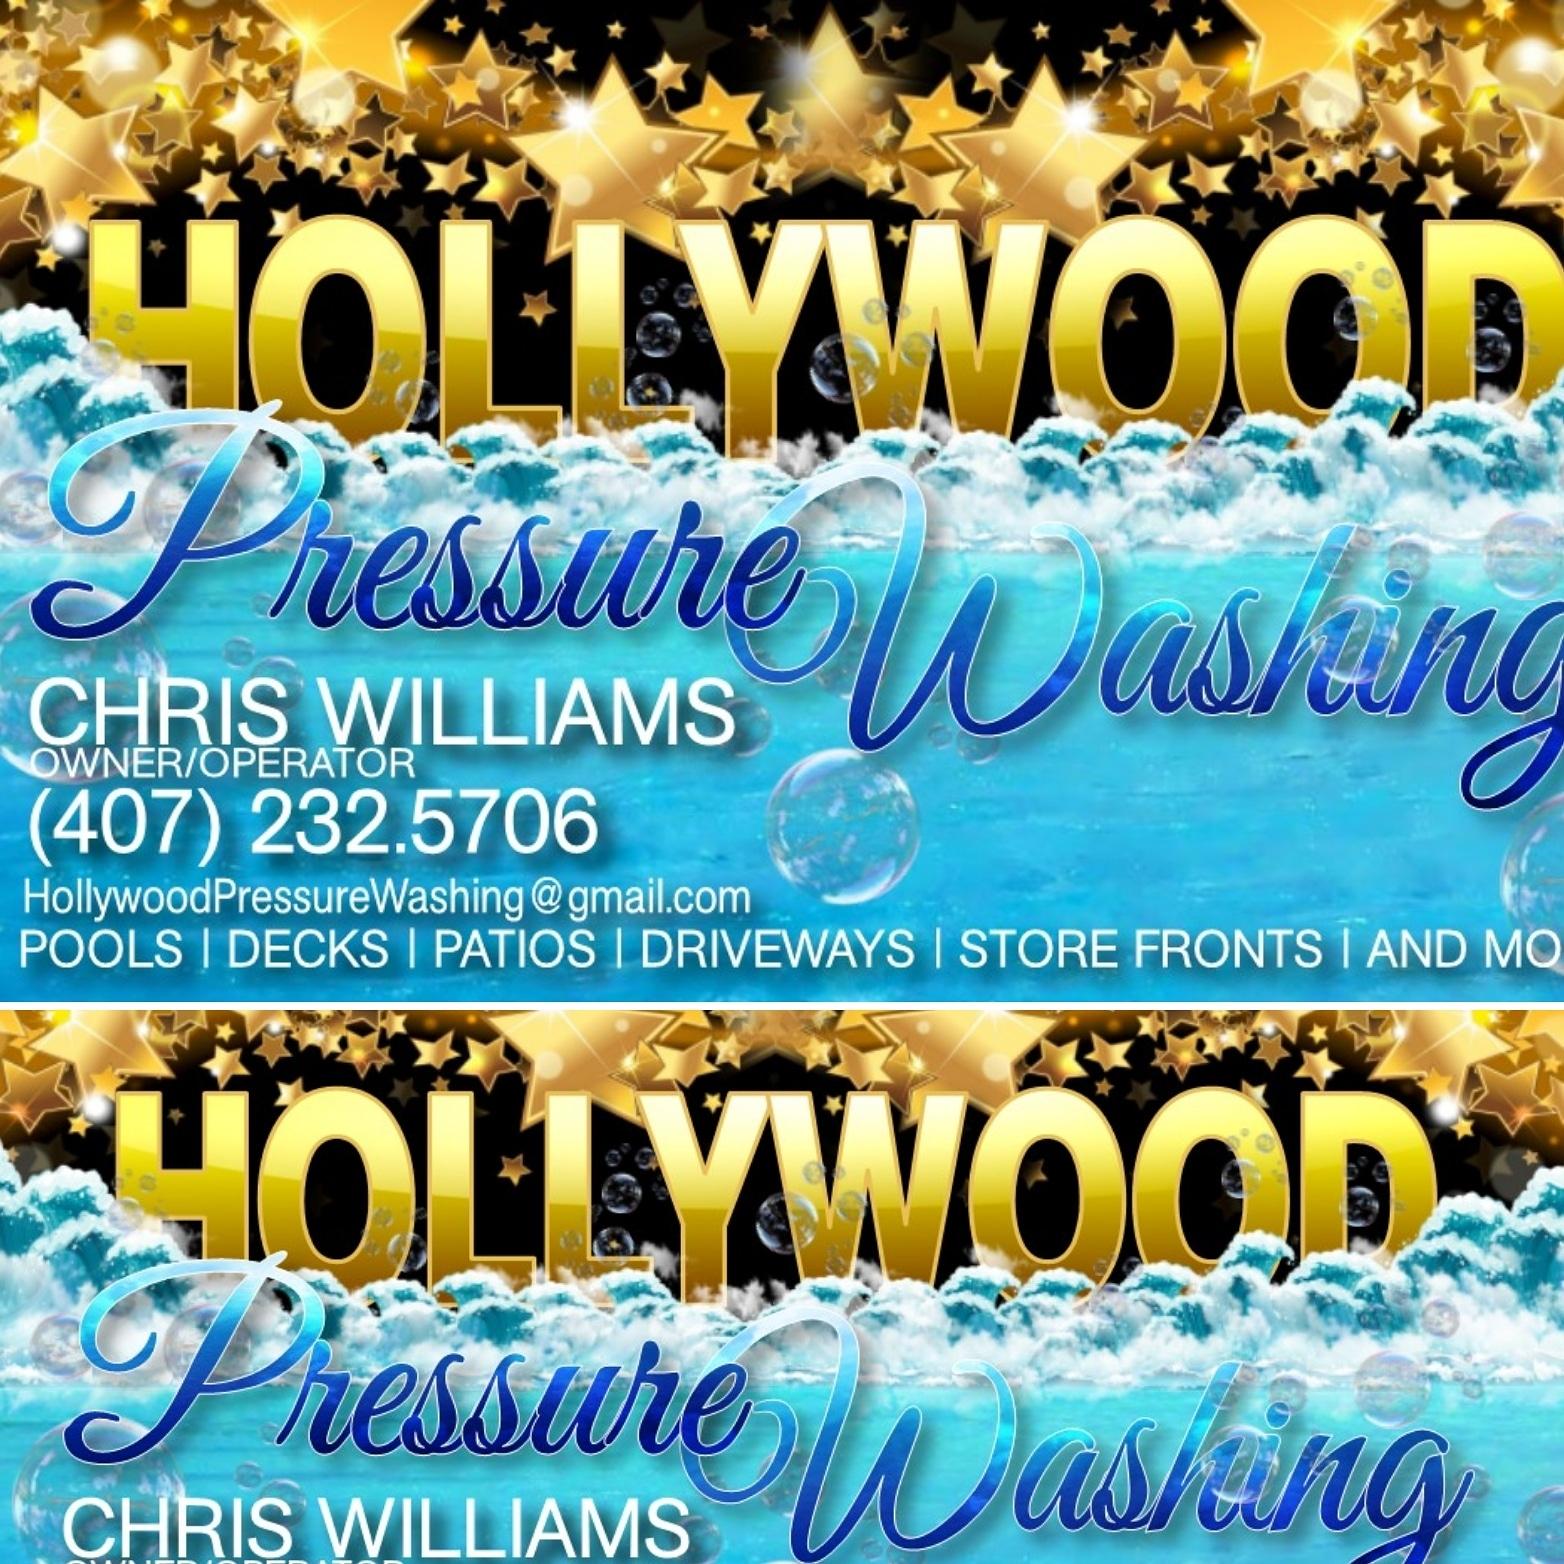 Hollywood Pressure Washing